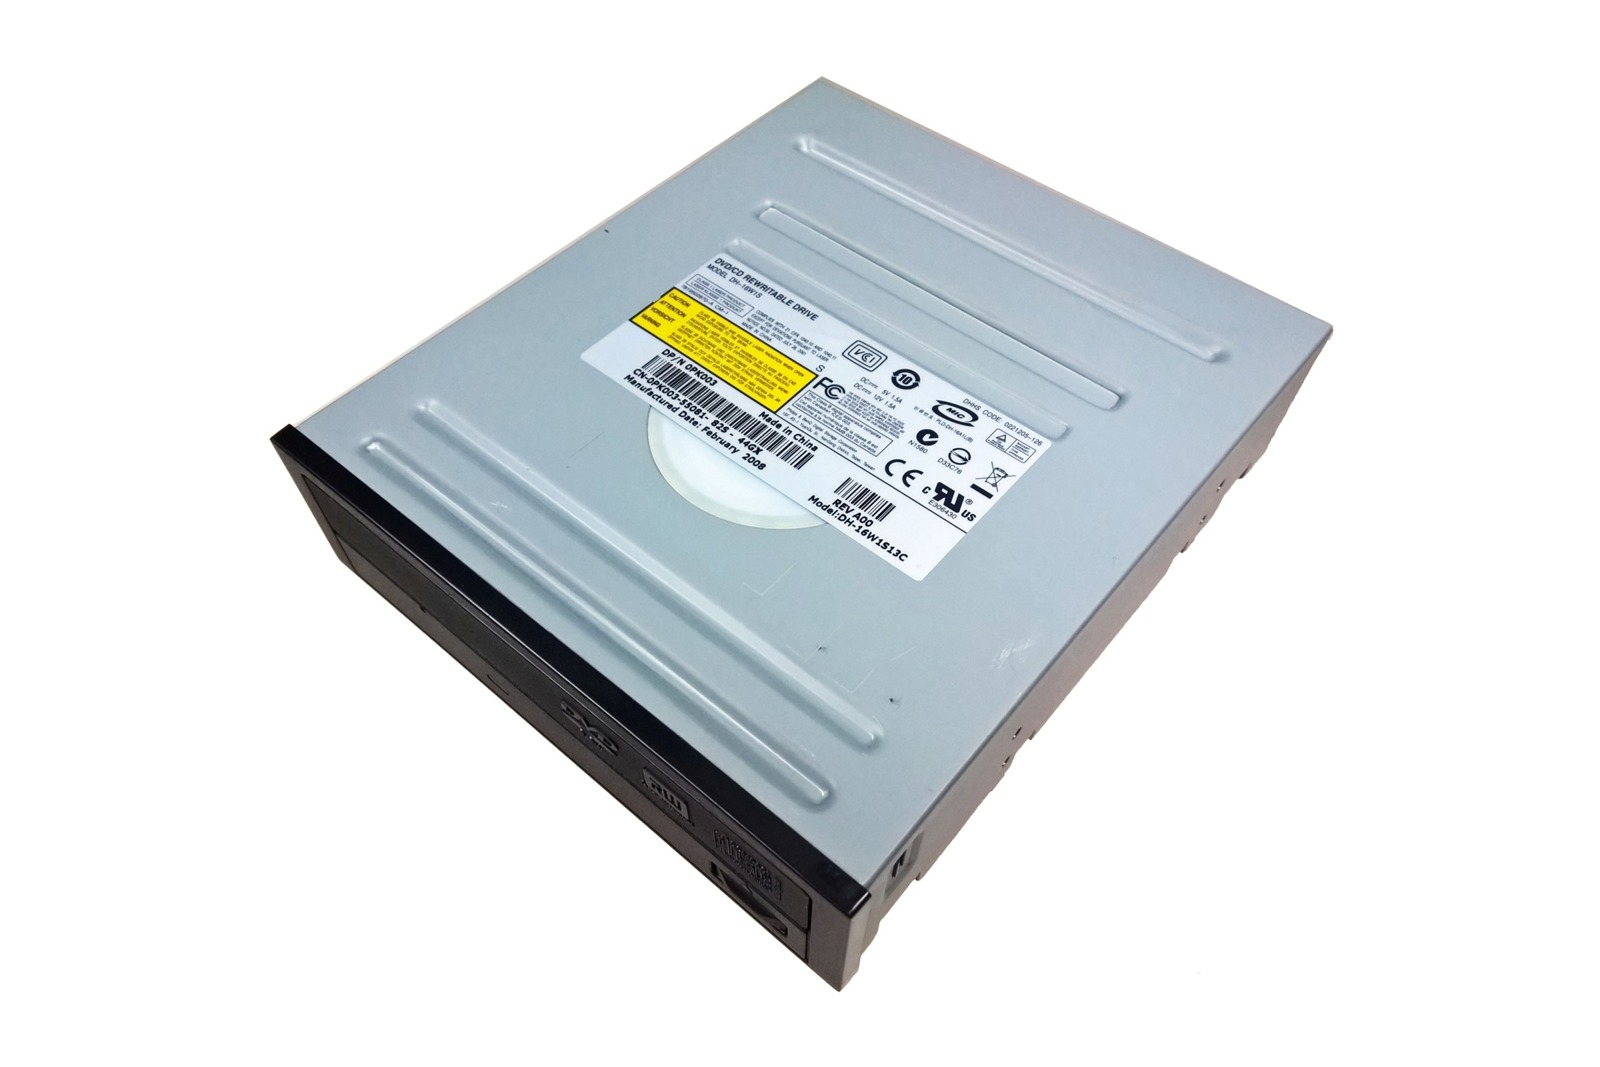 Burner Philips 16X DVD RW DL CD-RW SATA DH-16W1S SATA